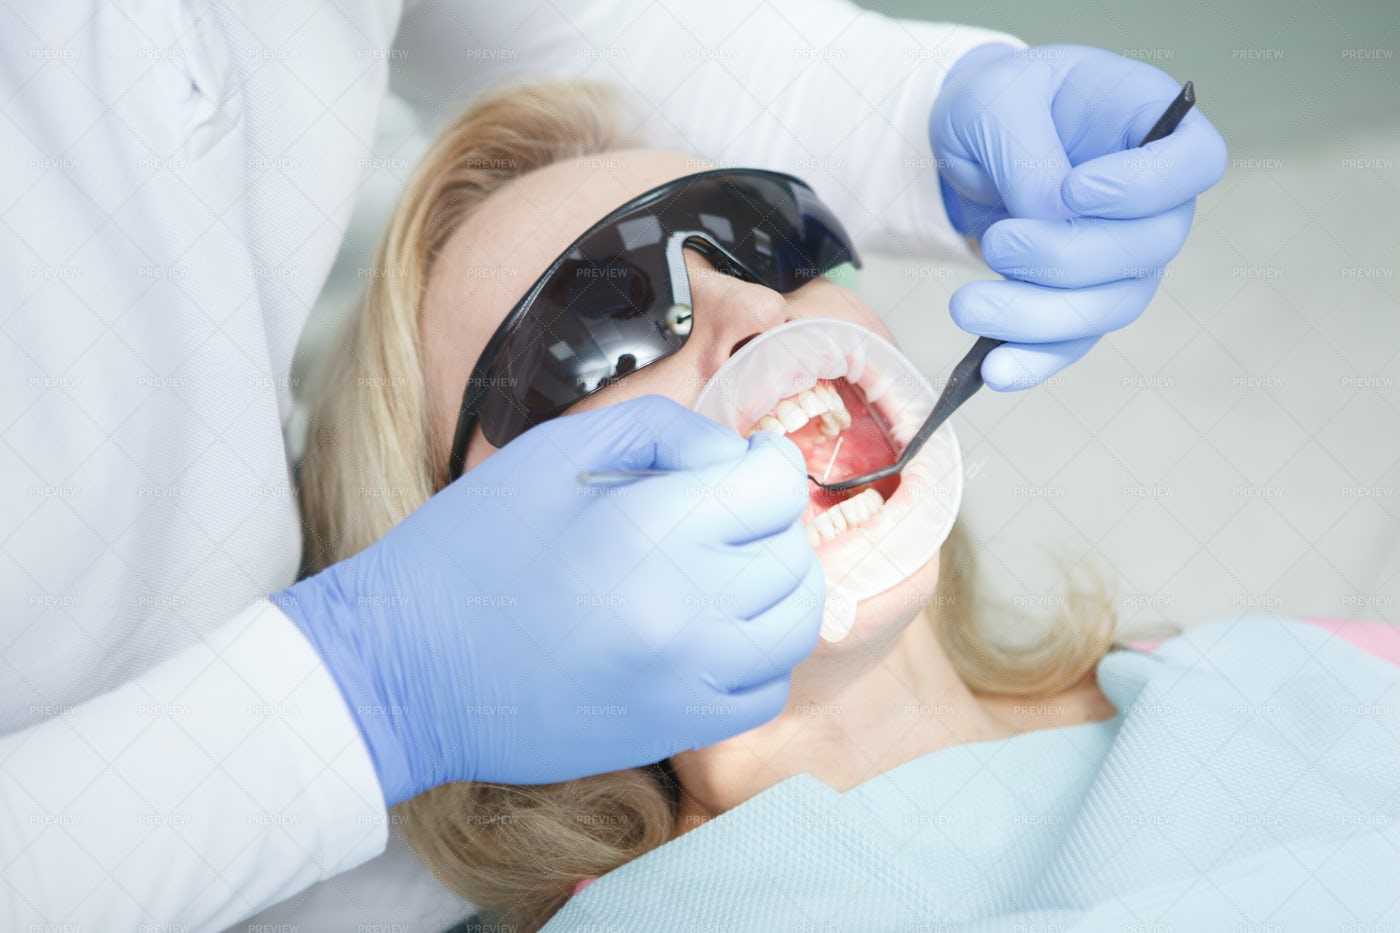 Woman Getting A Dental Treatment: Stock Photos